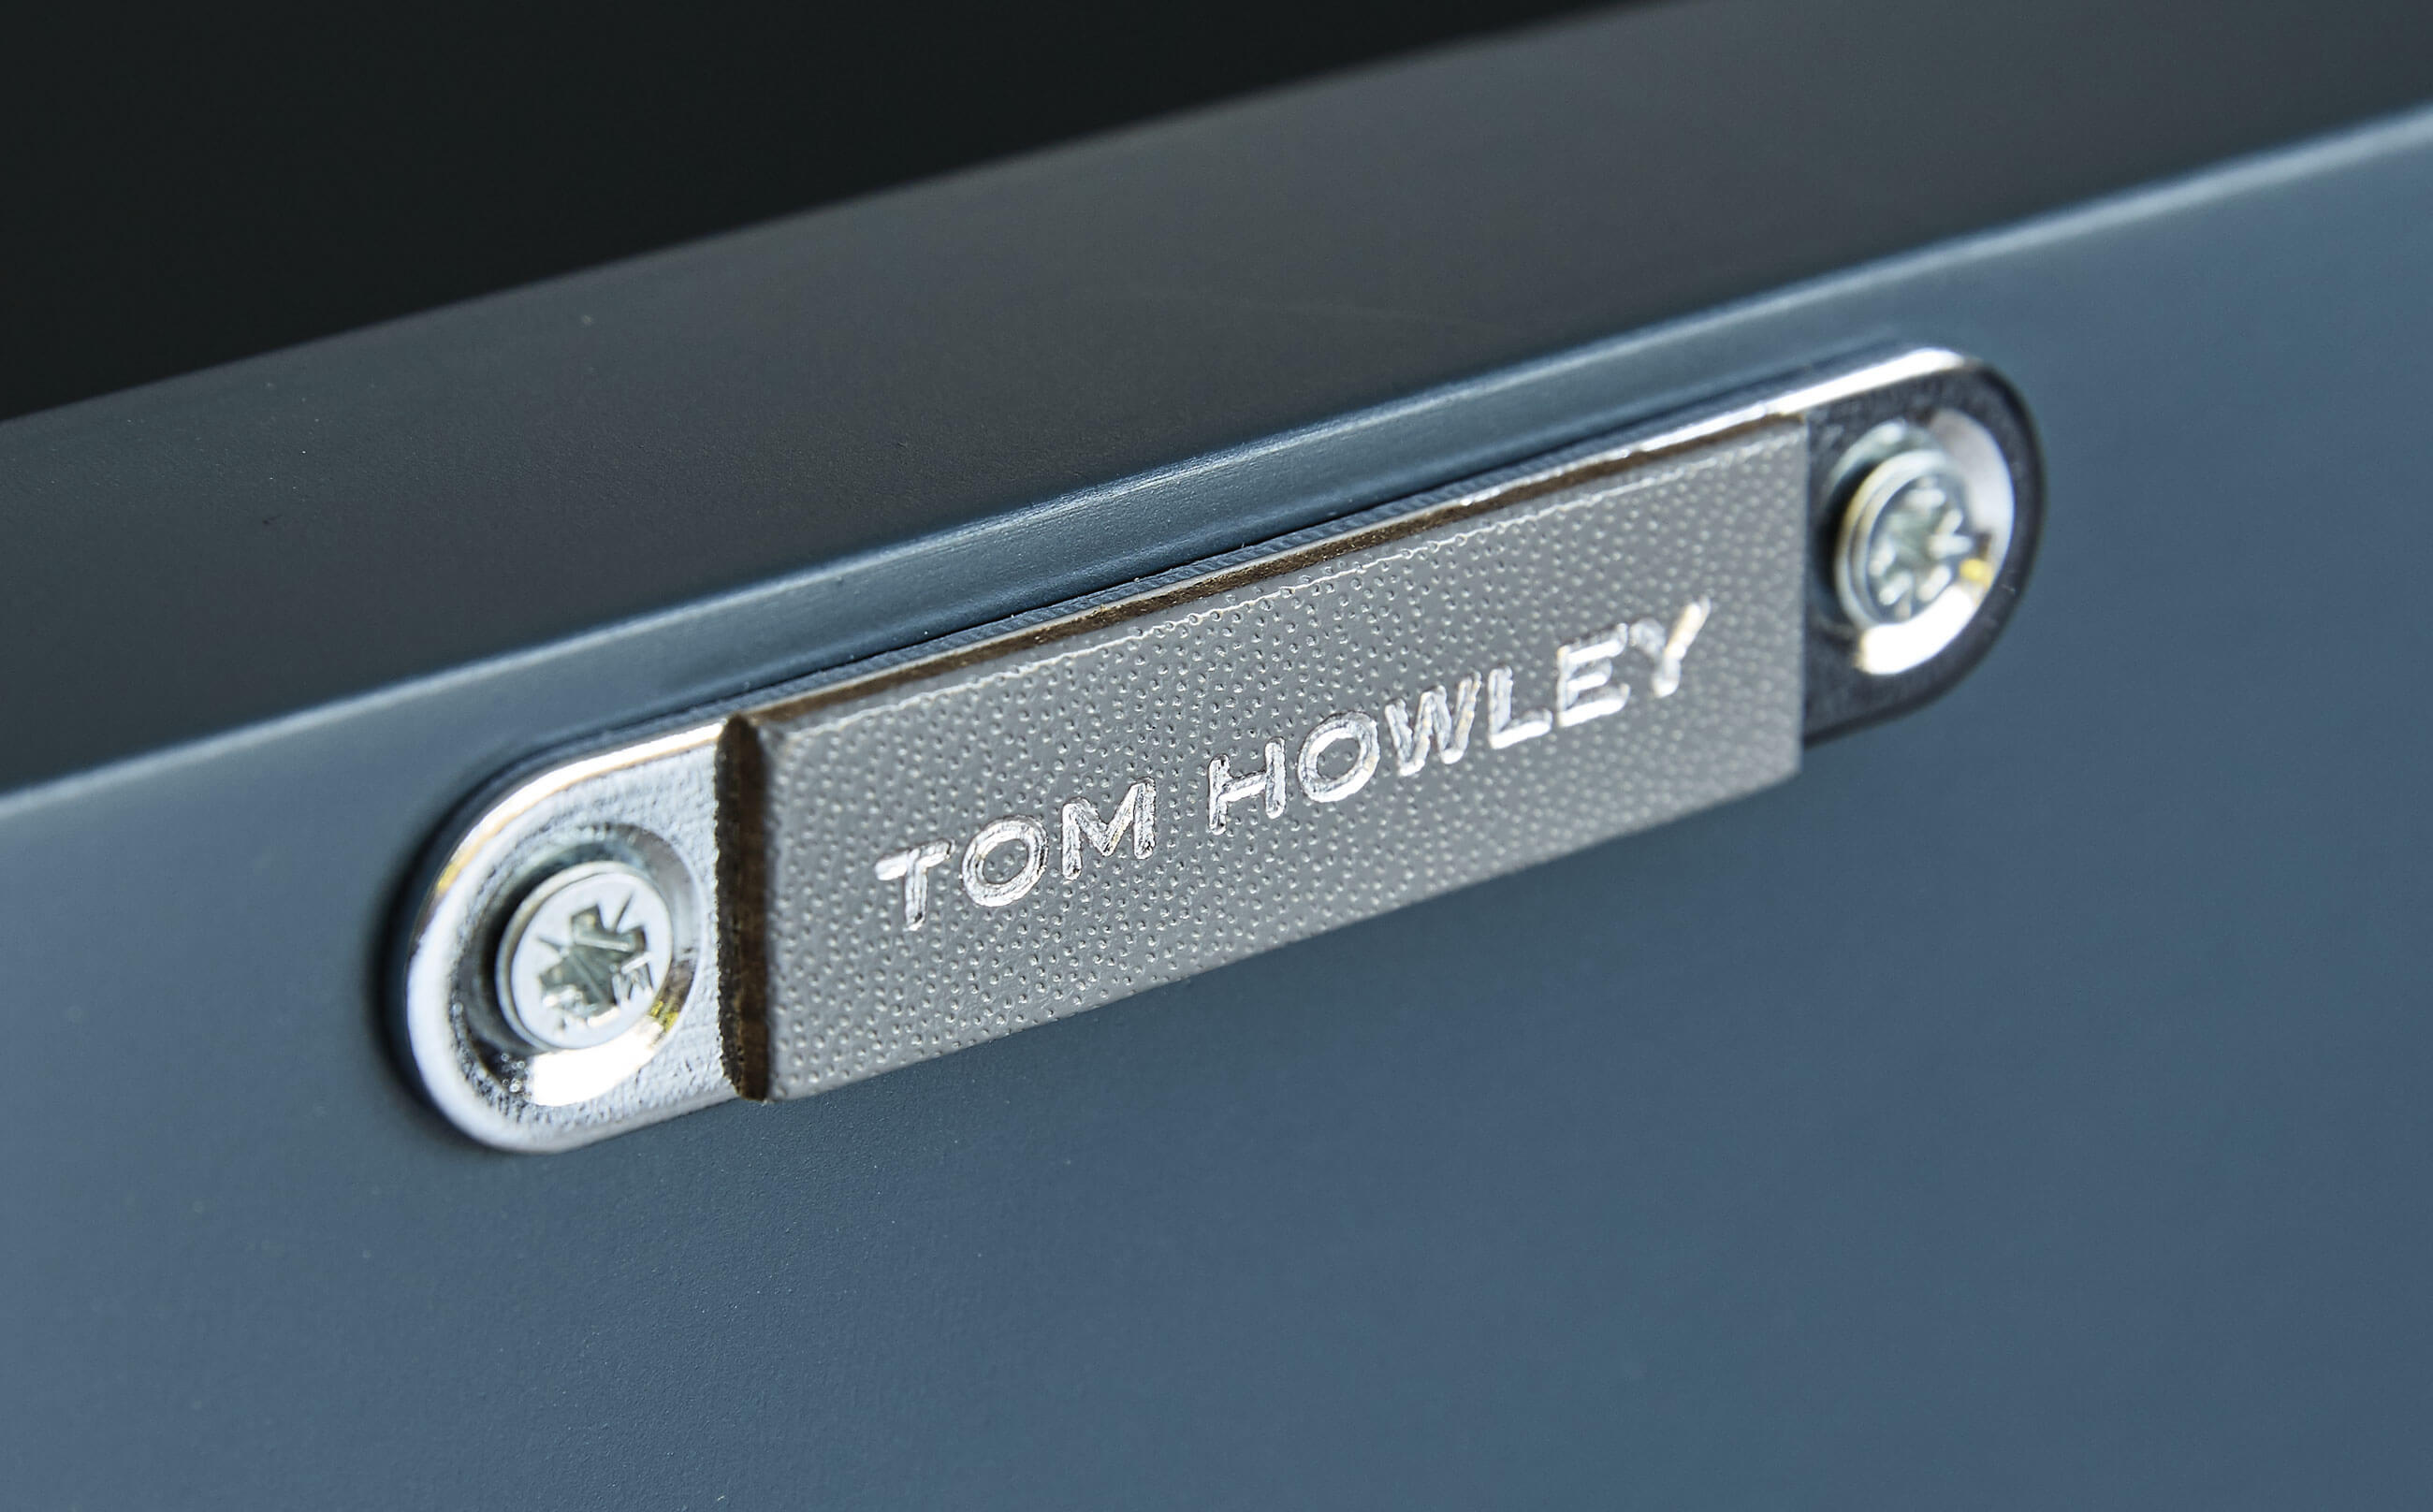 Blue Shaker Kitchen | Tom Howley